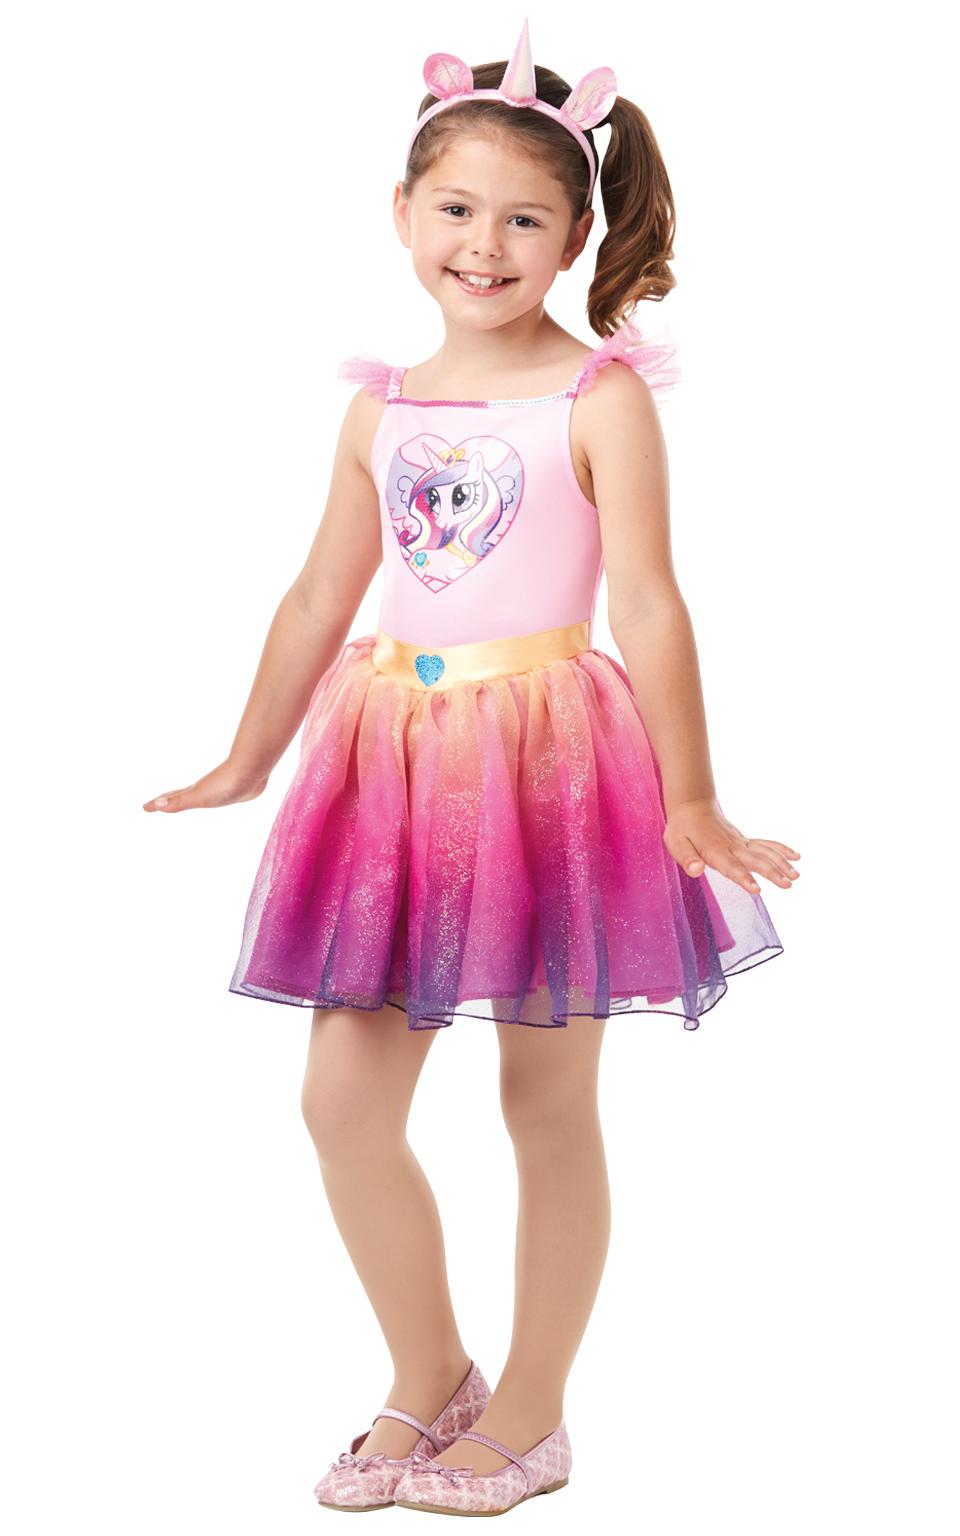 Fluttershy Ragazze My Little Pony Ragazze Costume Fiaba Per Bambini Costume